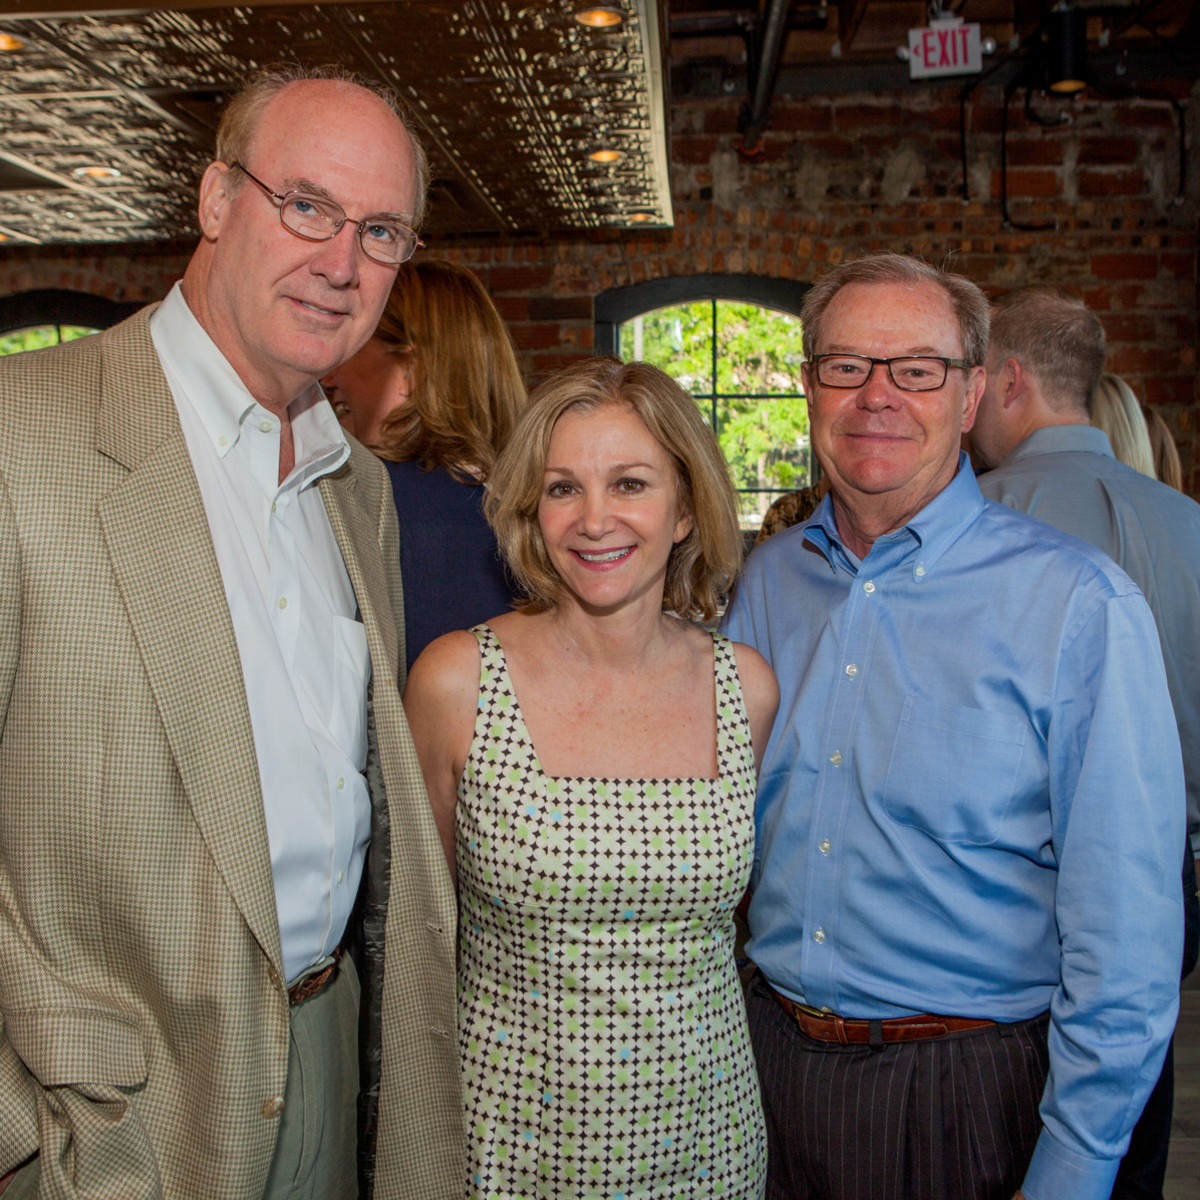 Houston, Pastorini party, June 2015, Kevin Henry, Sherri Gordon, Charles Gordon